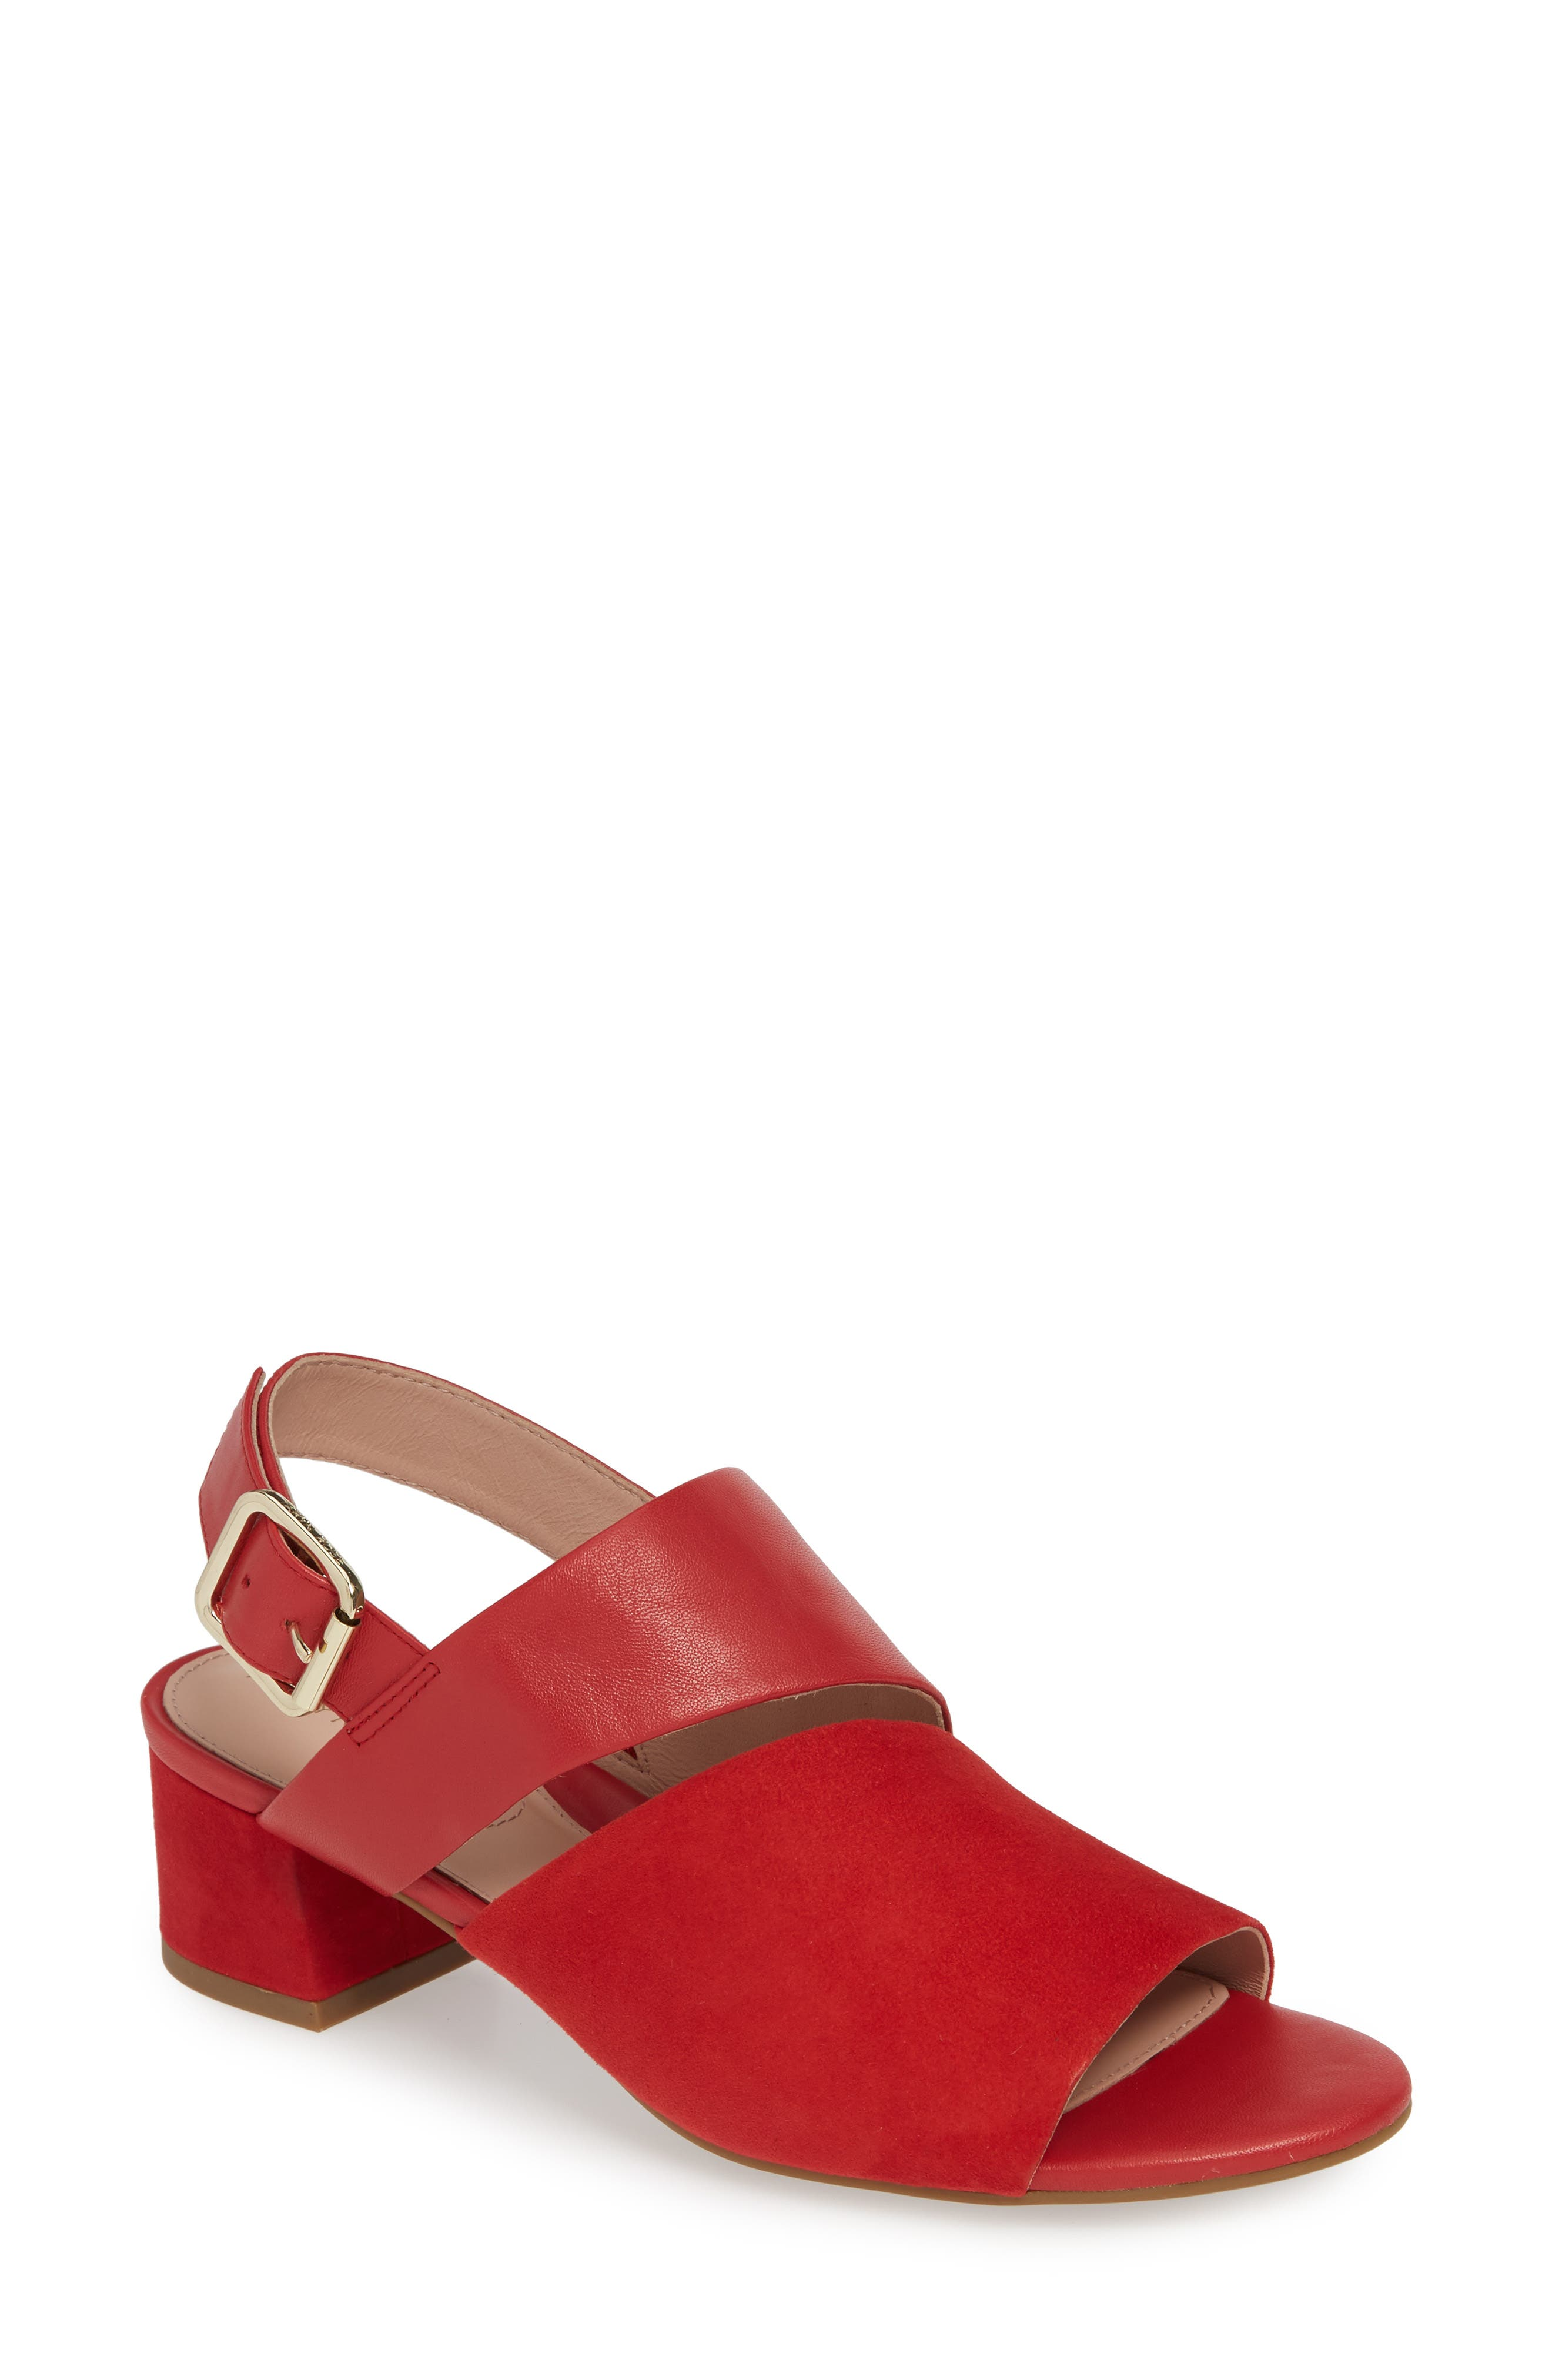 Taryn Rose Noa Sandal, Red